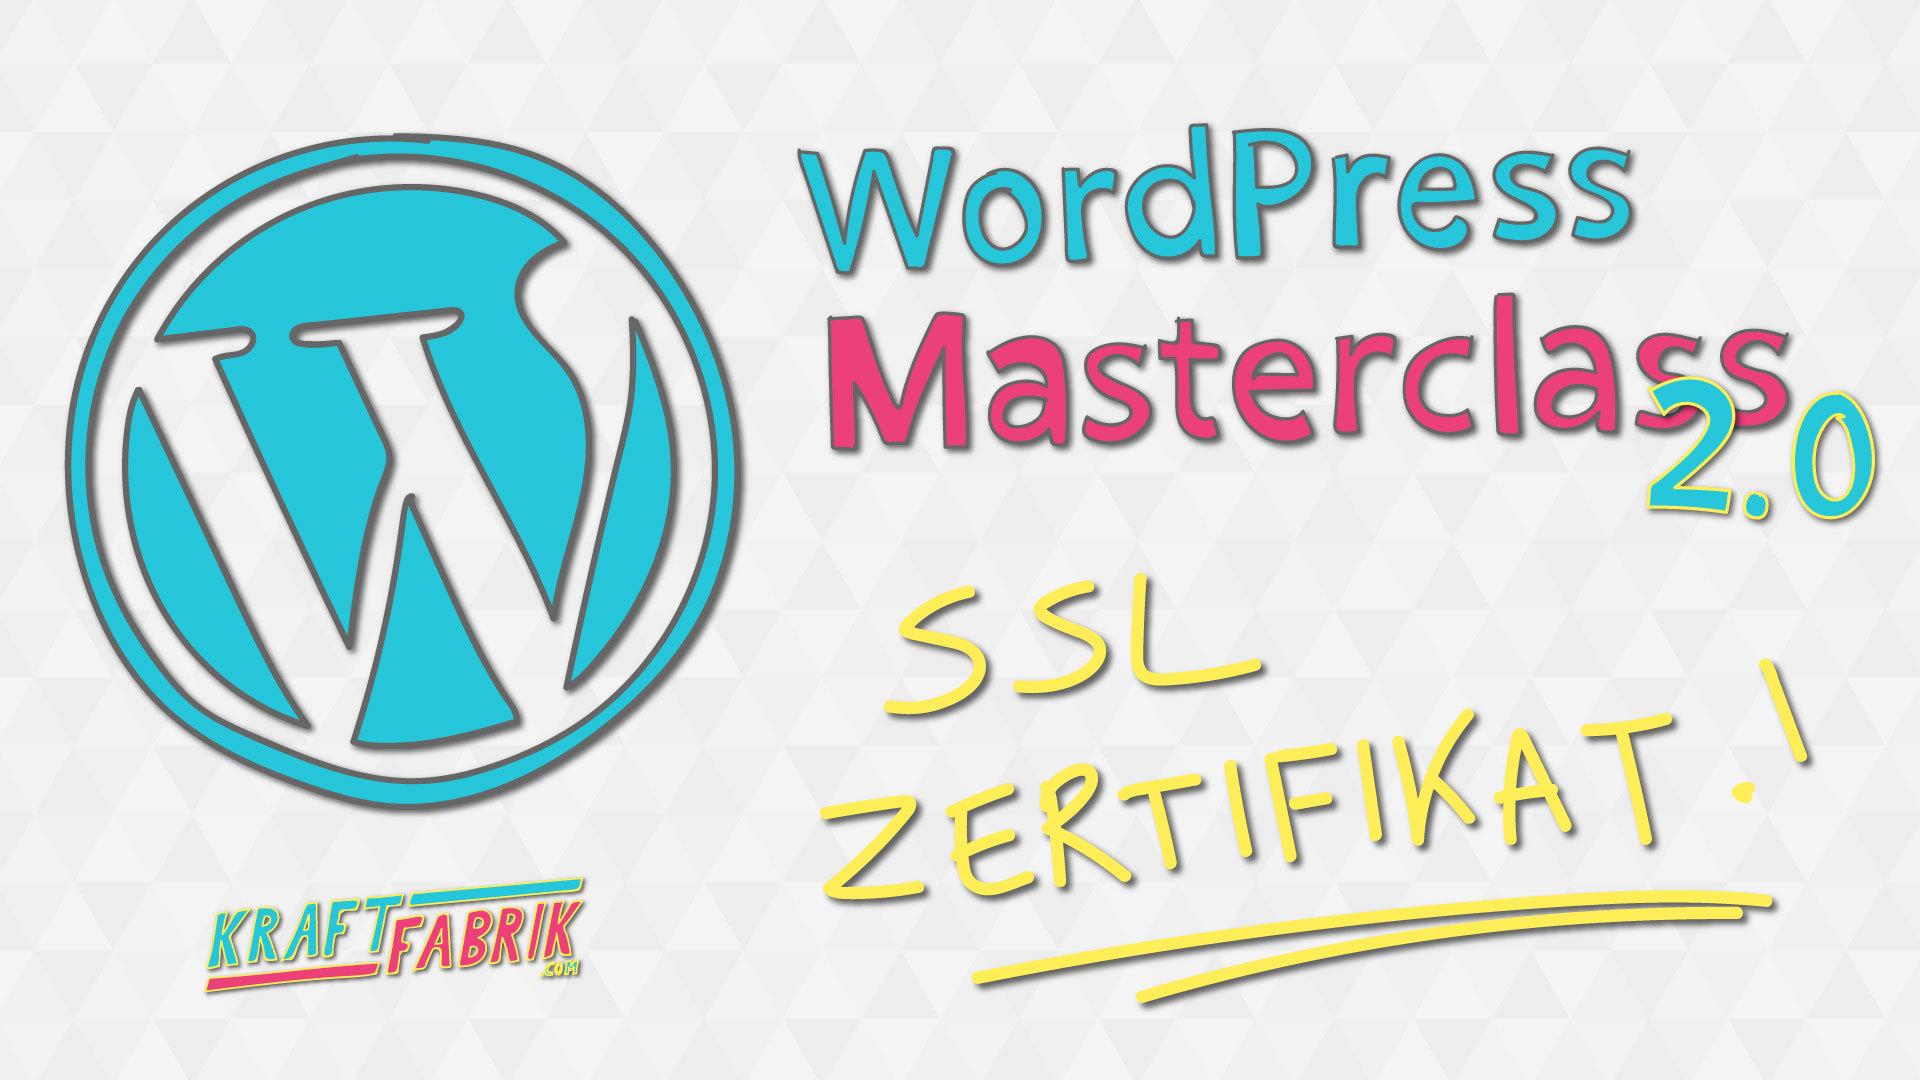 Ssl Zertifikat Installieren Wordpress Masterclass 20 M2 V3